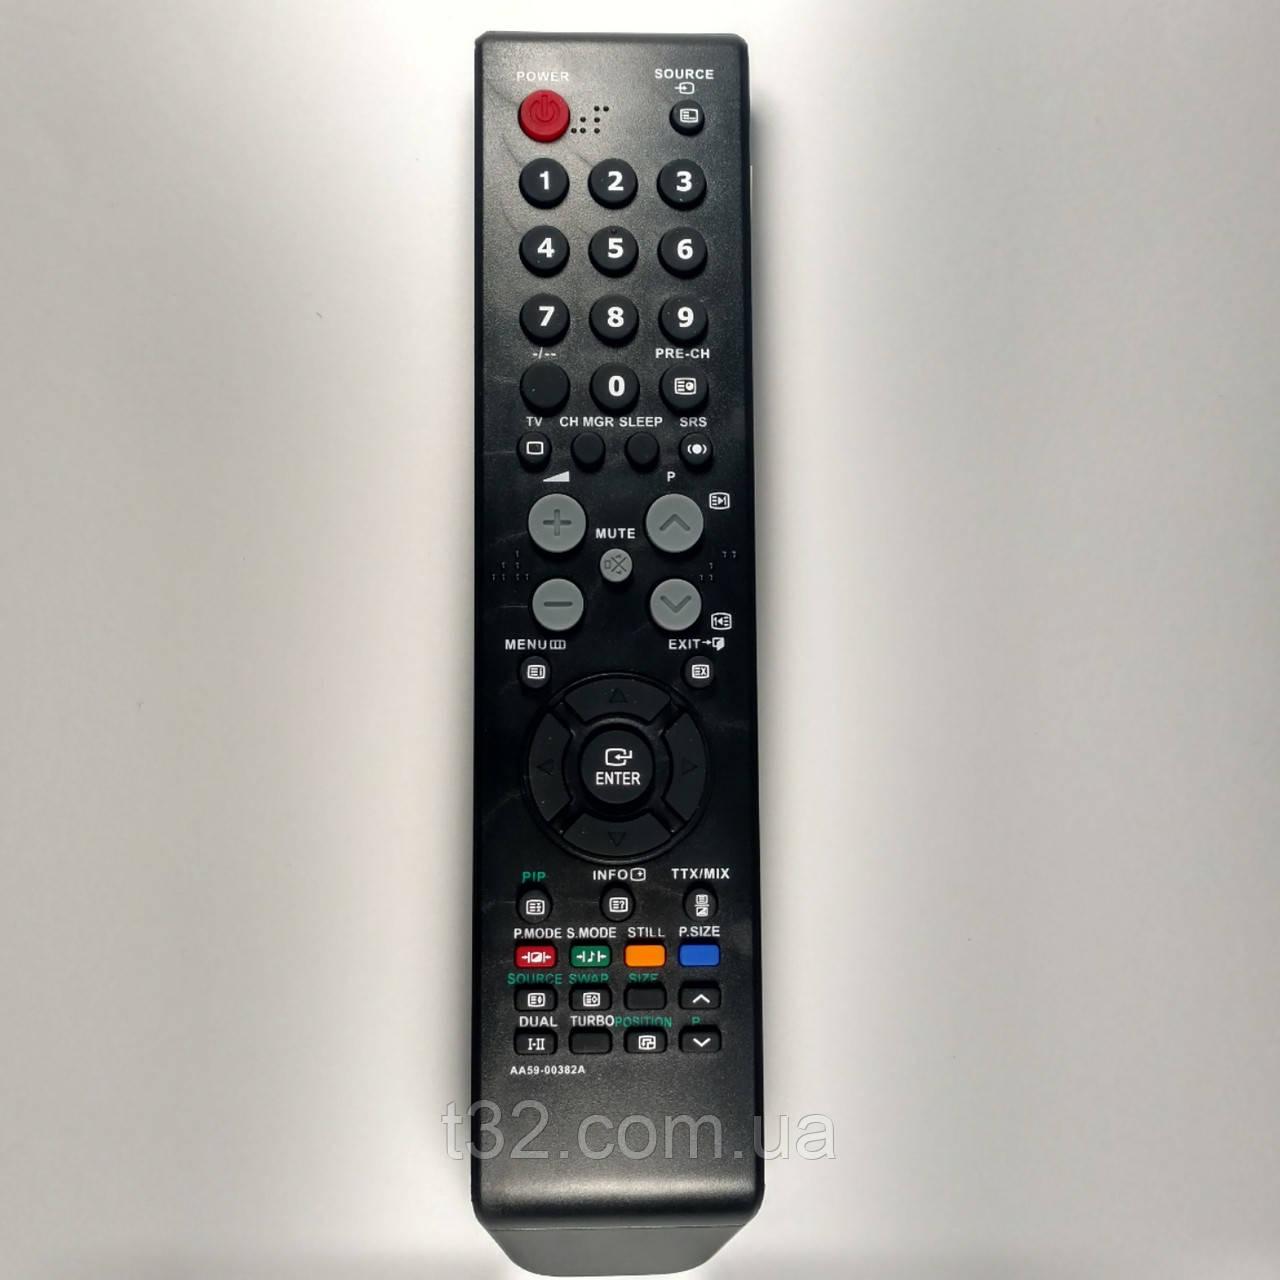 Пульт Samsung AA59-00382A [13/10] [TV]